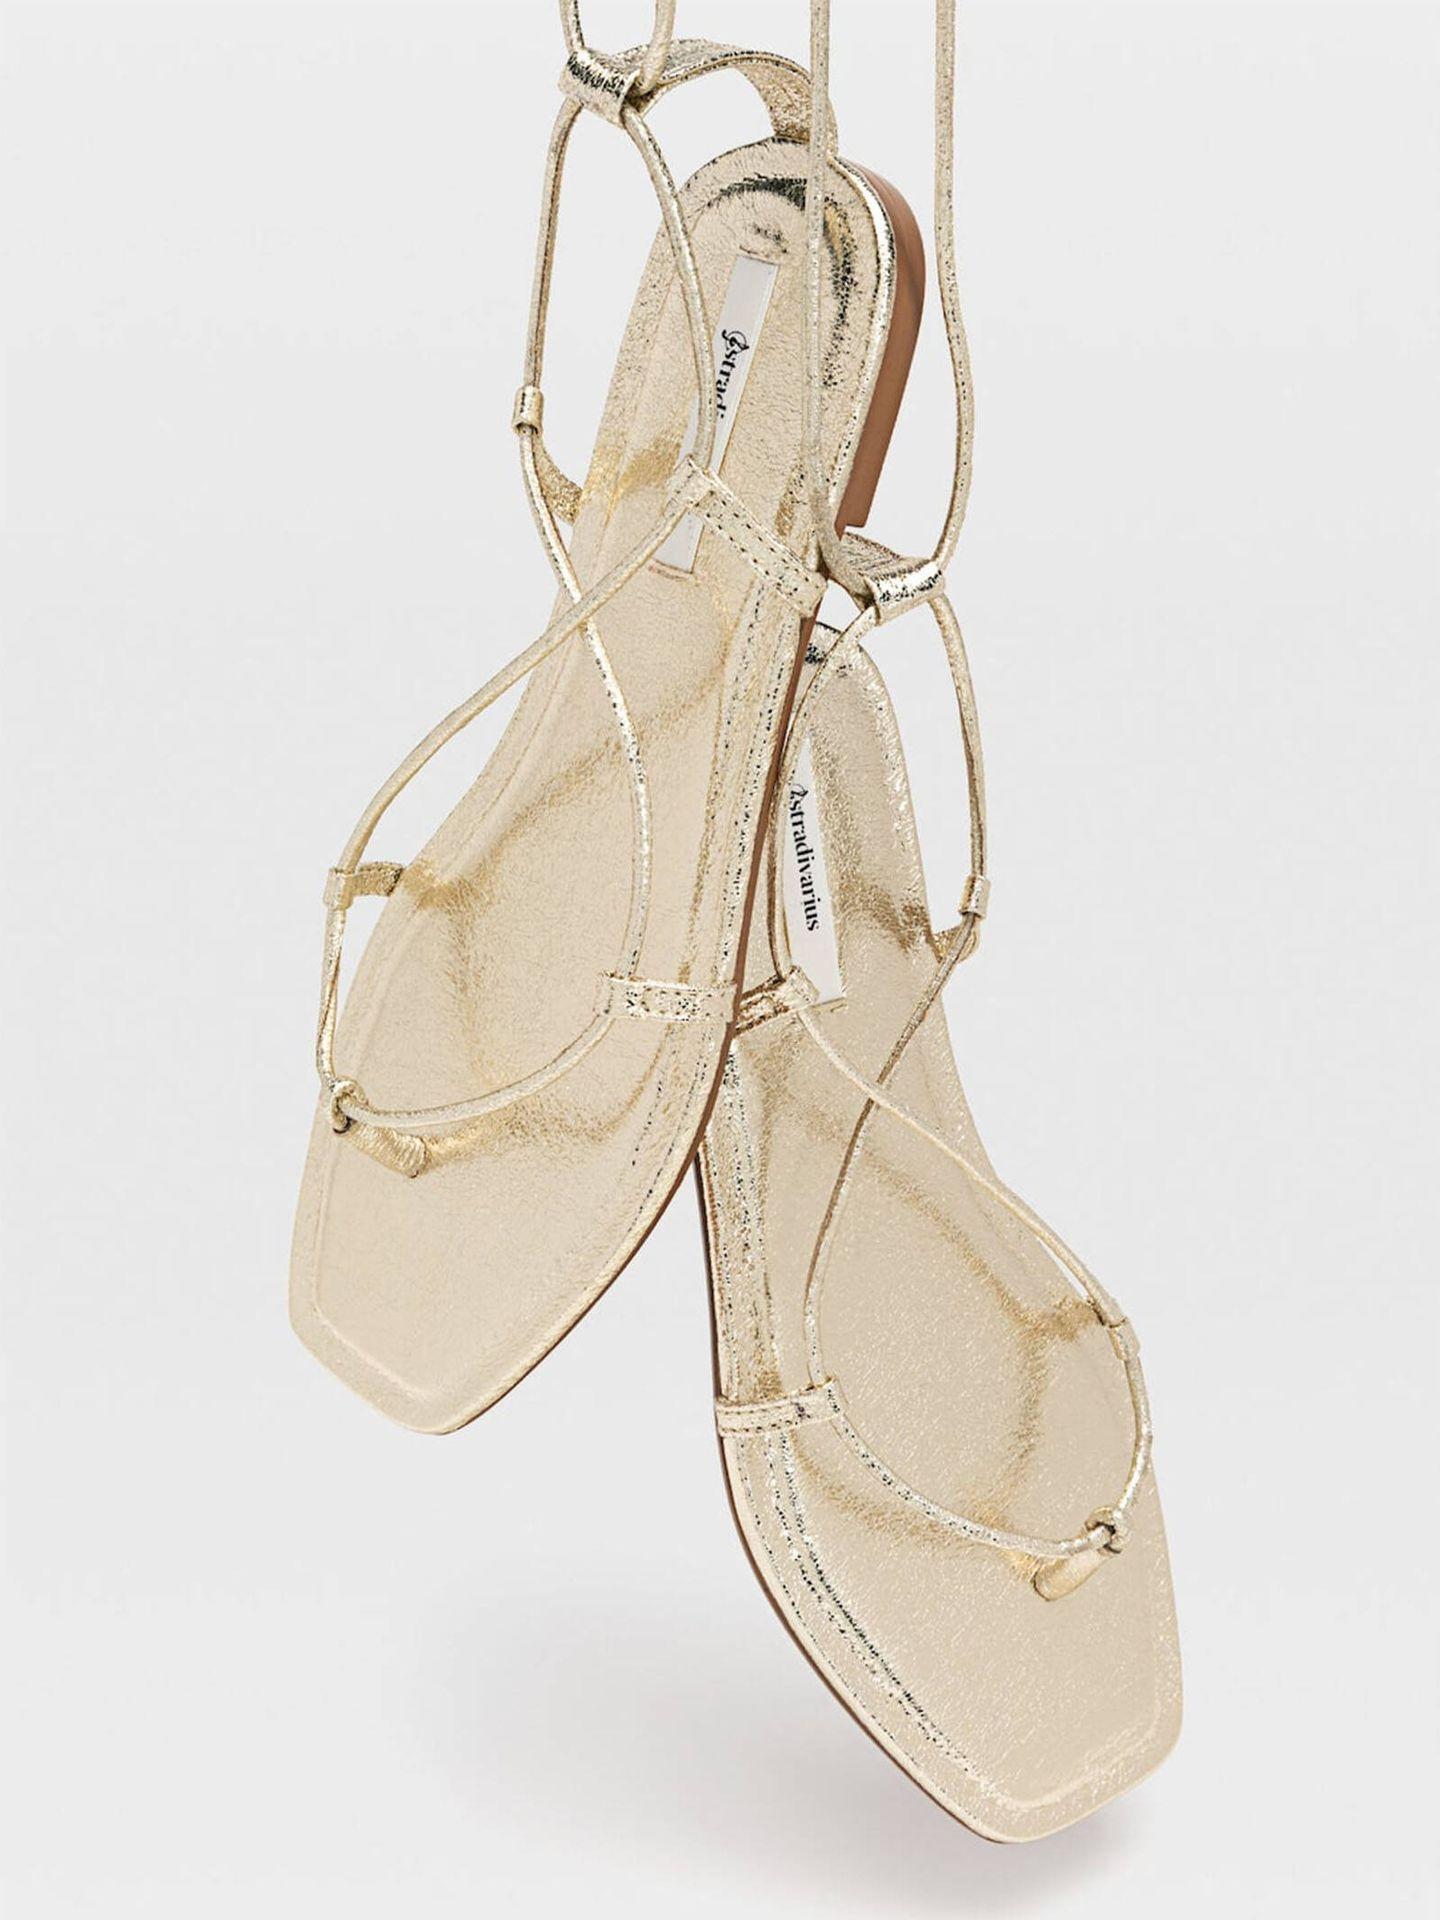 Sandalias planas con tiras de Stradivarius. (Cortesía)